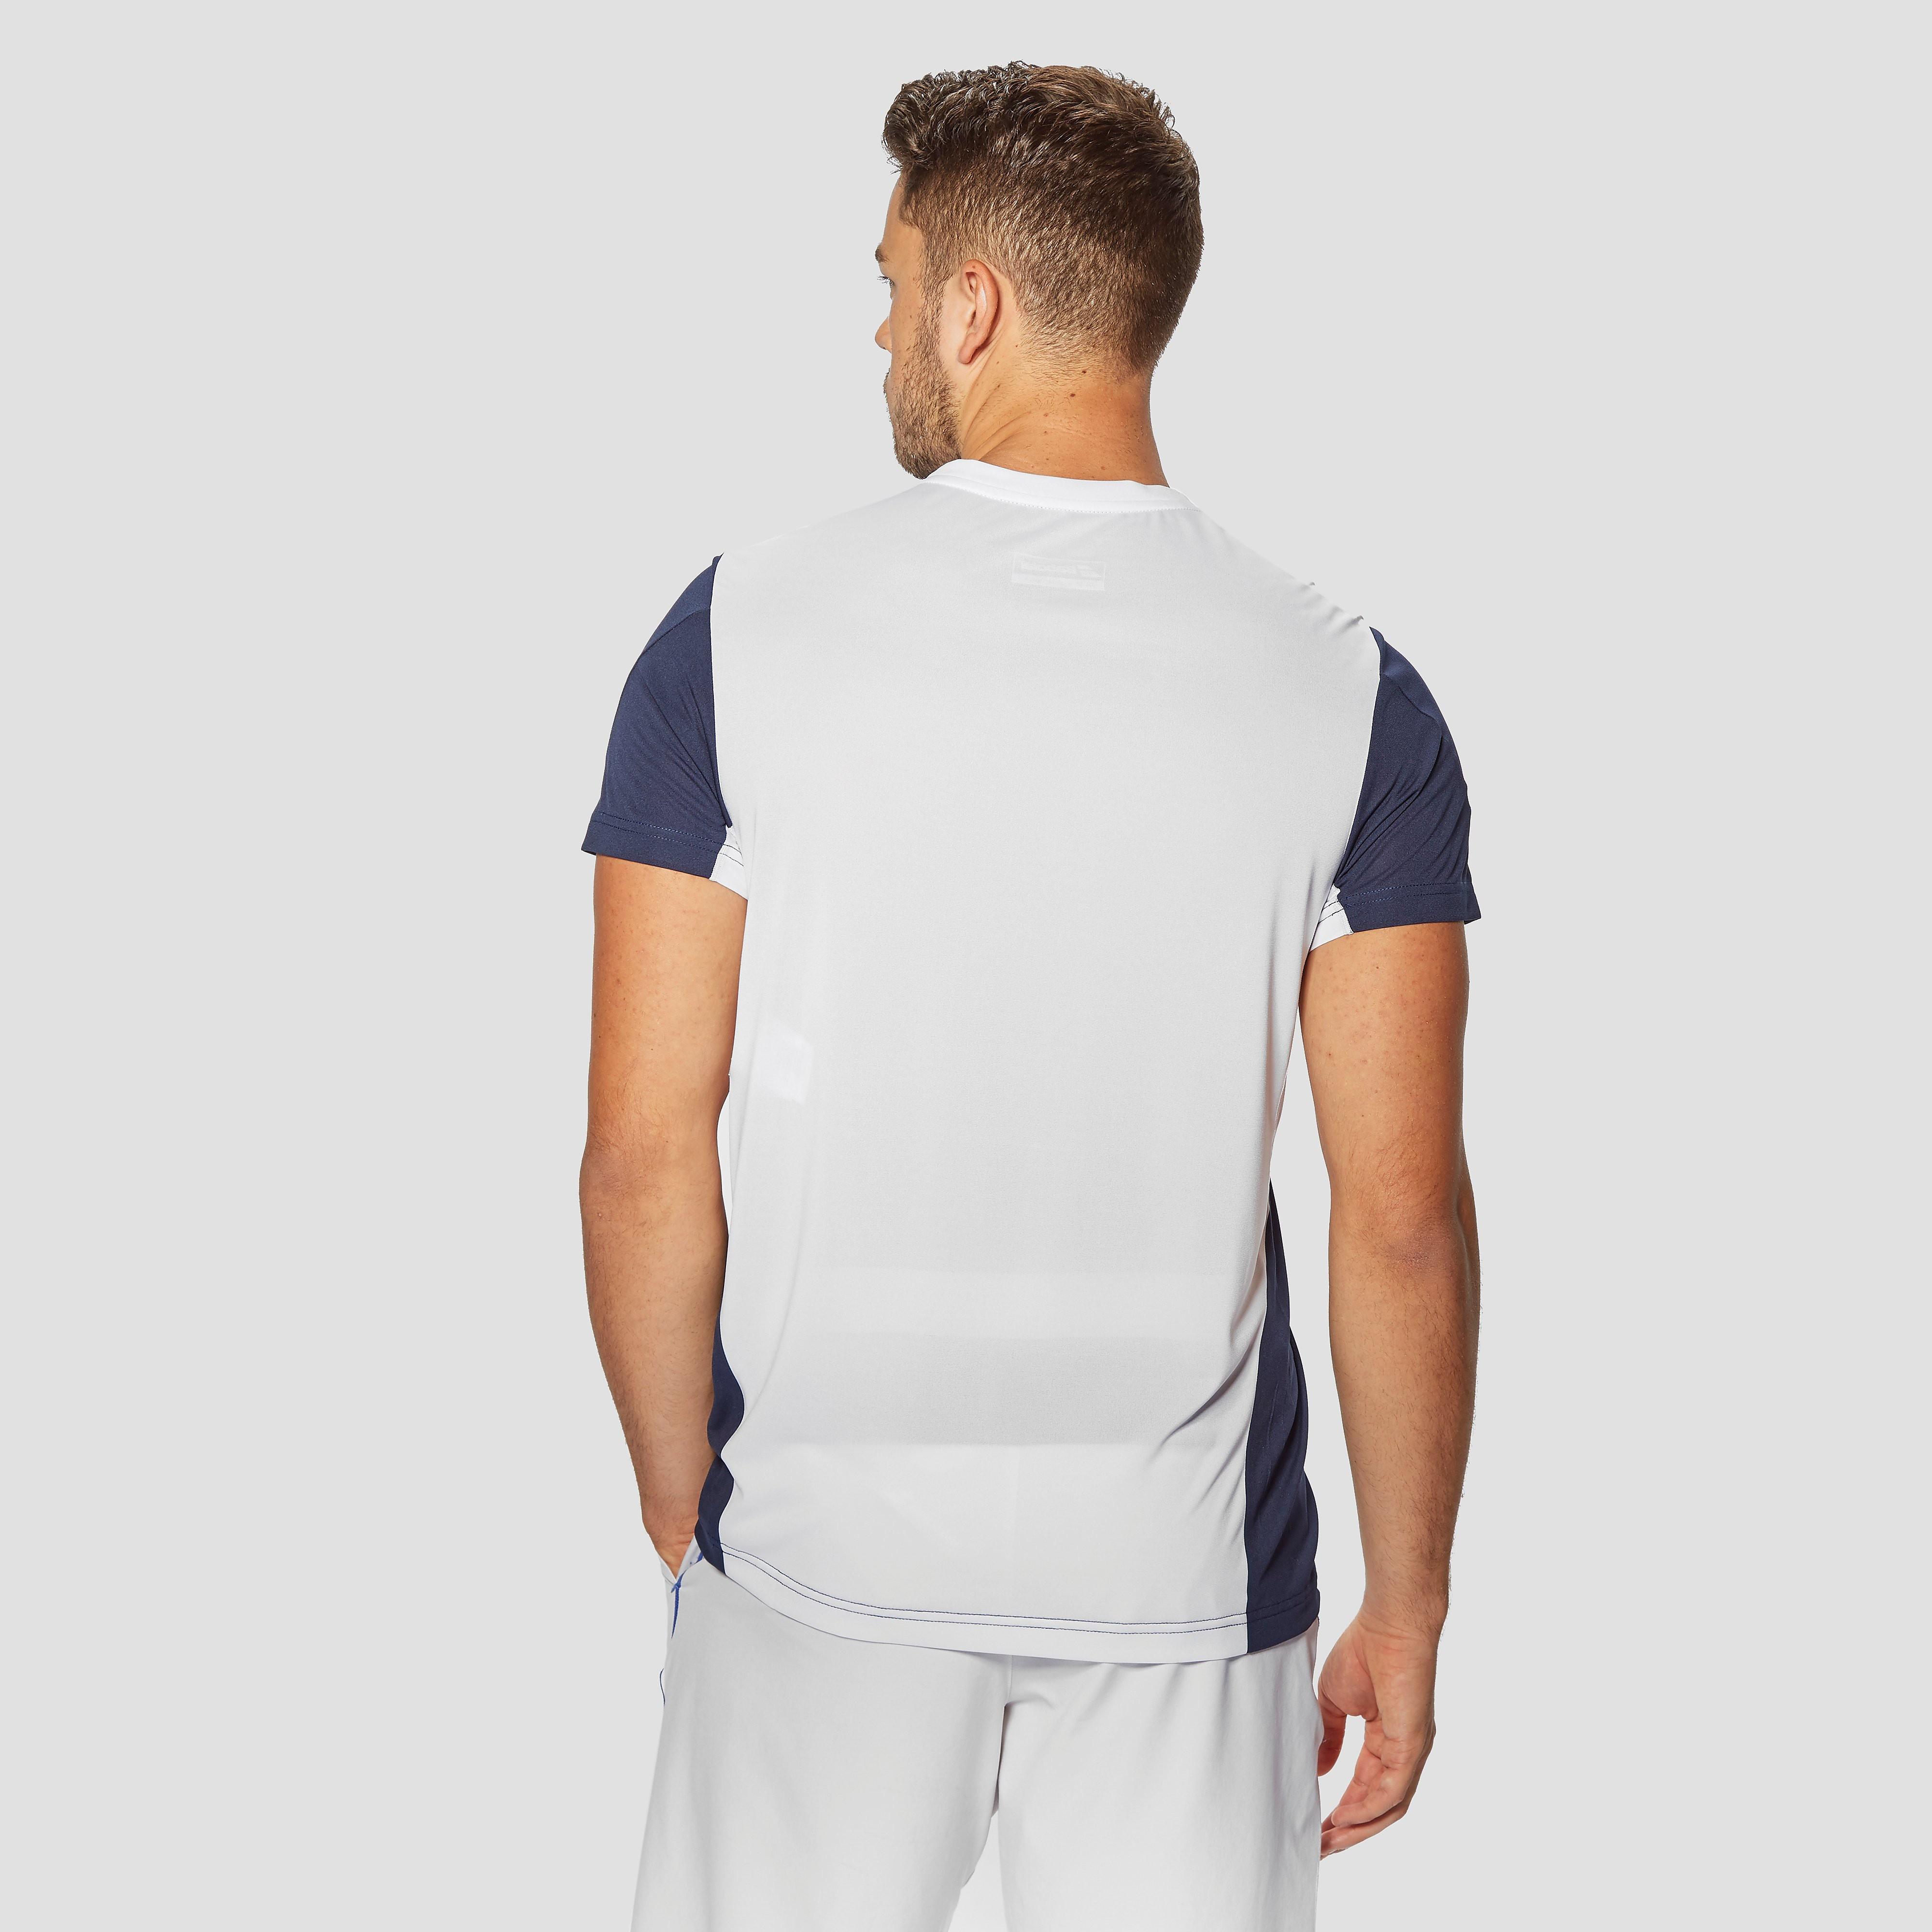 Babolat Wimbledon Performance Men's Crew Neck T-Shirt